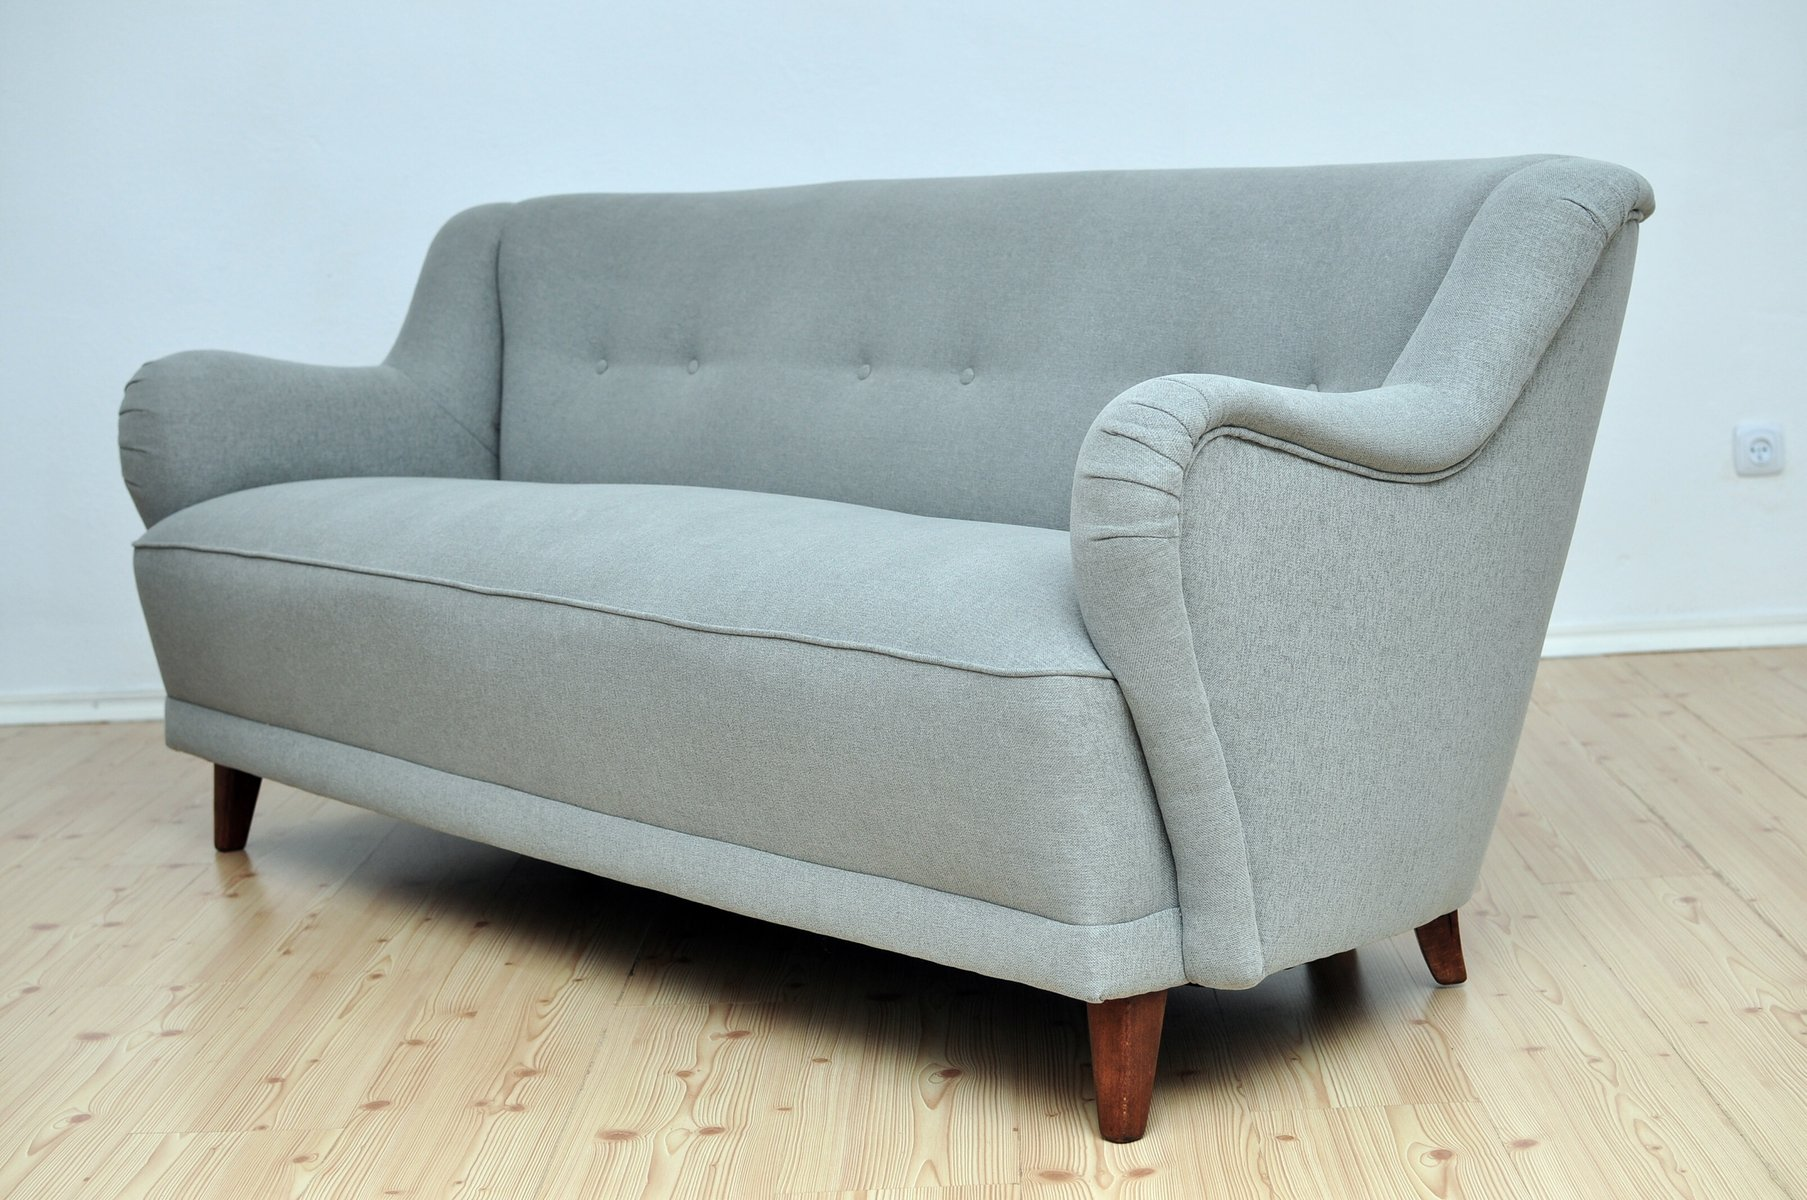 graues sofa 1950er bei pamono kaufen. Black Bedroom Furniture Sets. Home Design Ideas